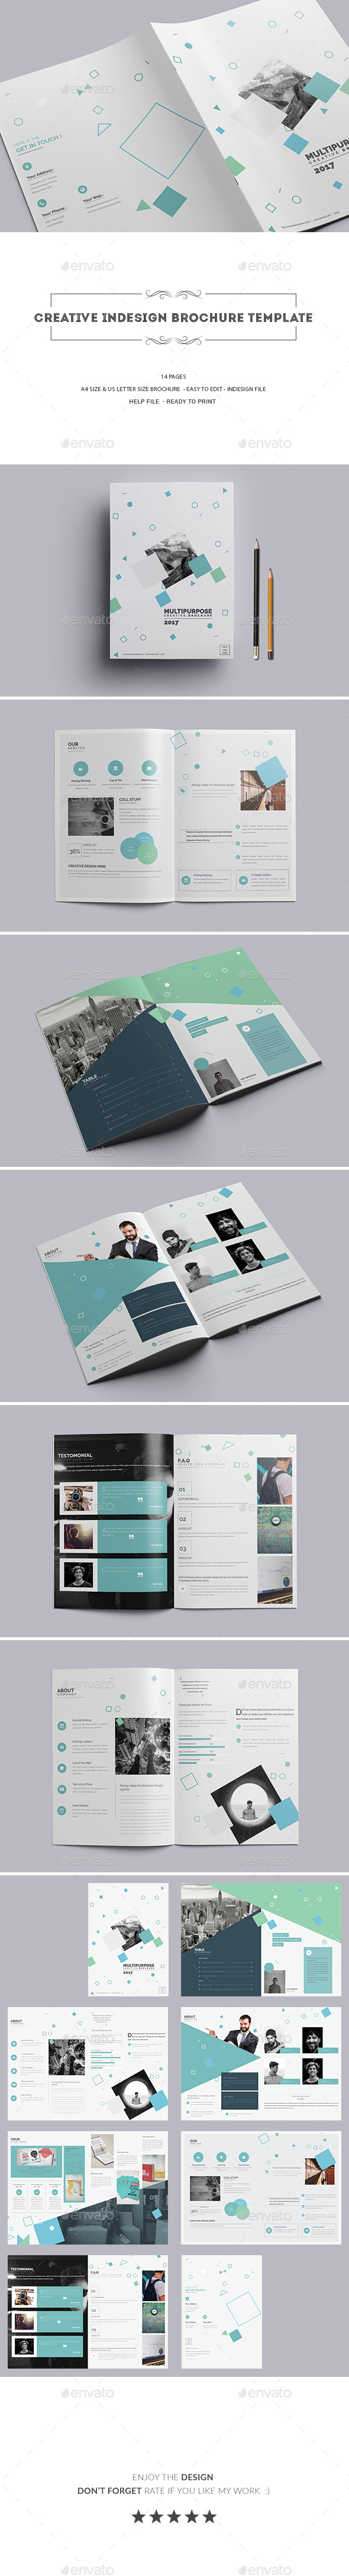 Creative Indesign Brochure Template - Corporate Brochures